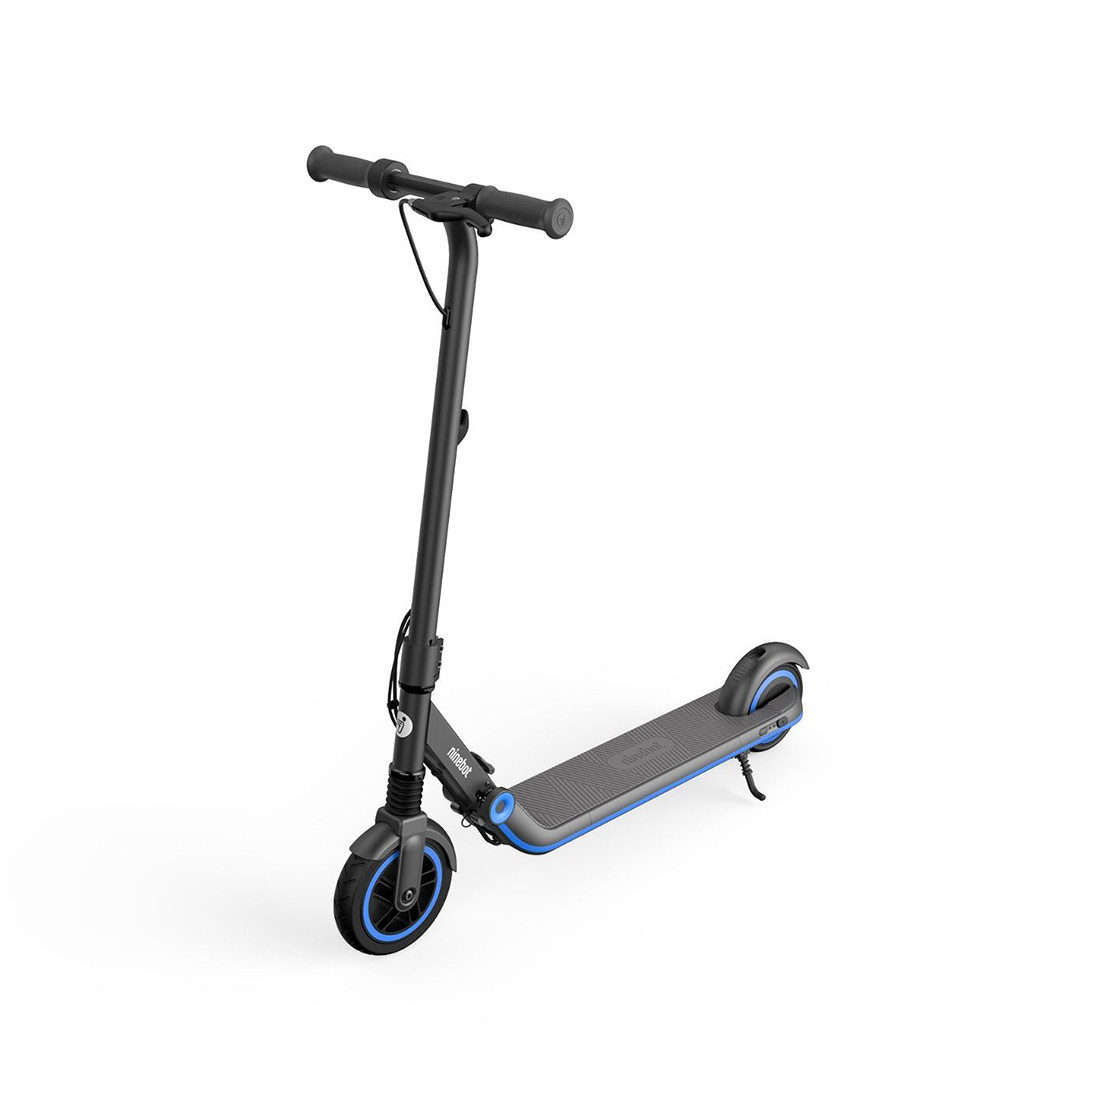 Электросамокат детский Ninebot KickScooter E10 Серый - фото 1